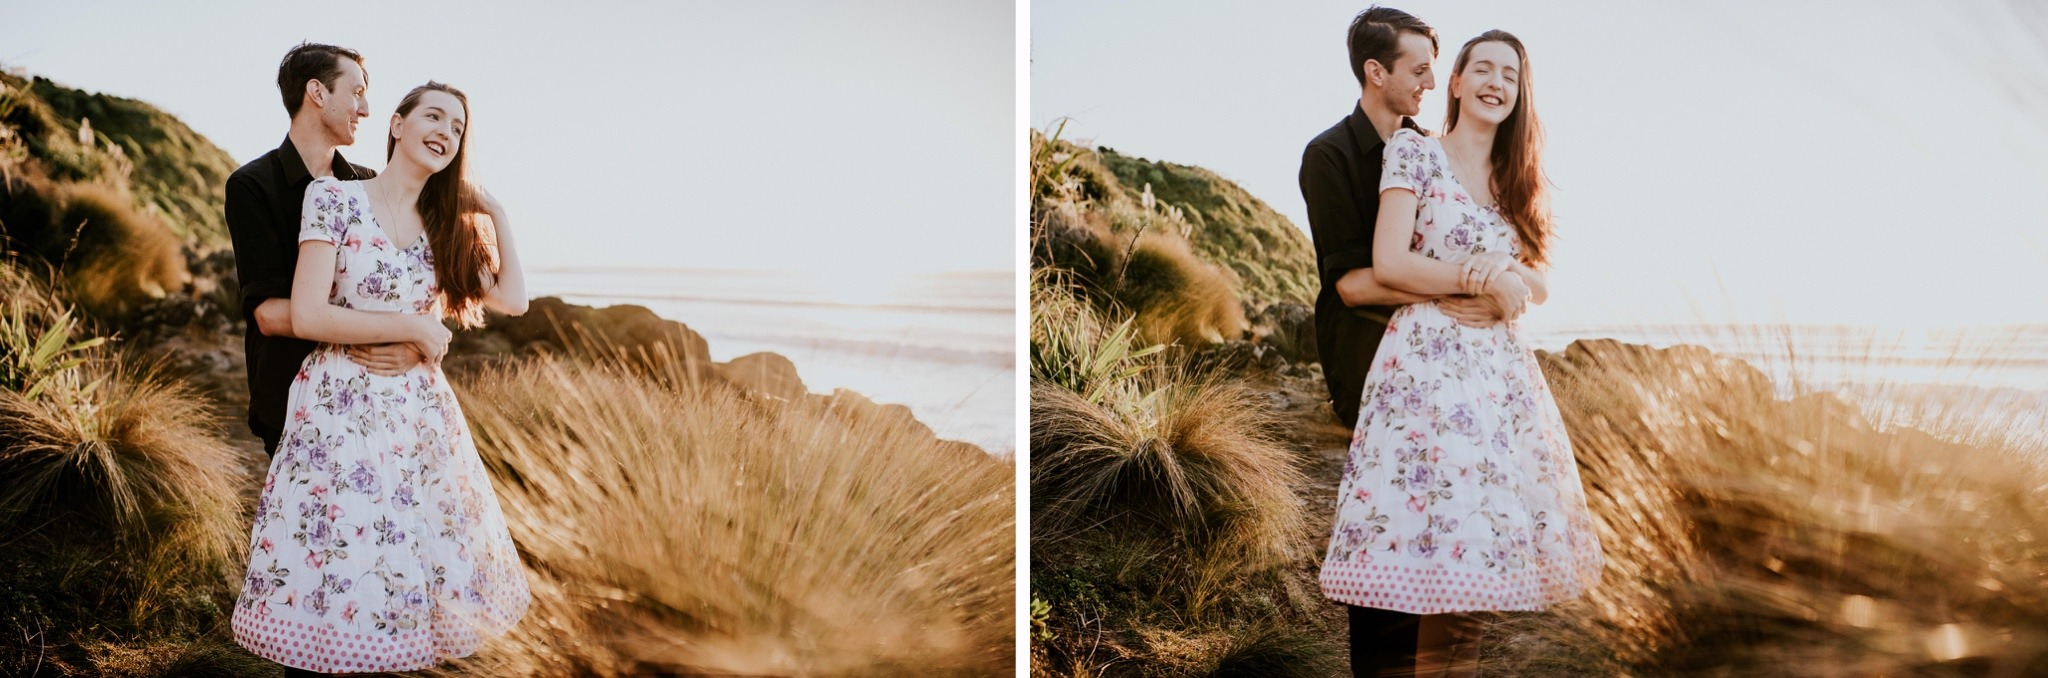 wedding photographer hamilton new zealand 1007 4